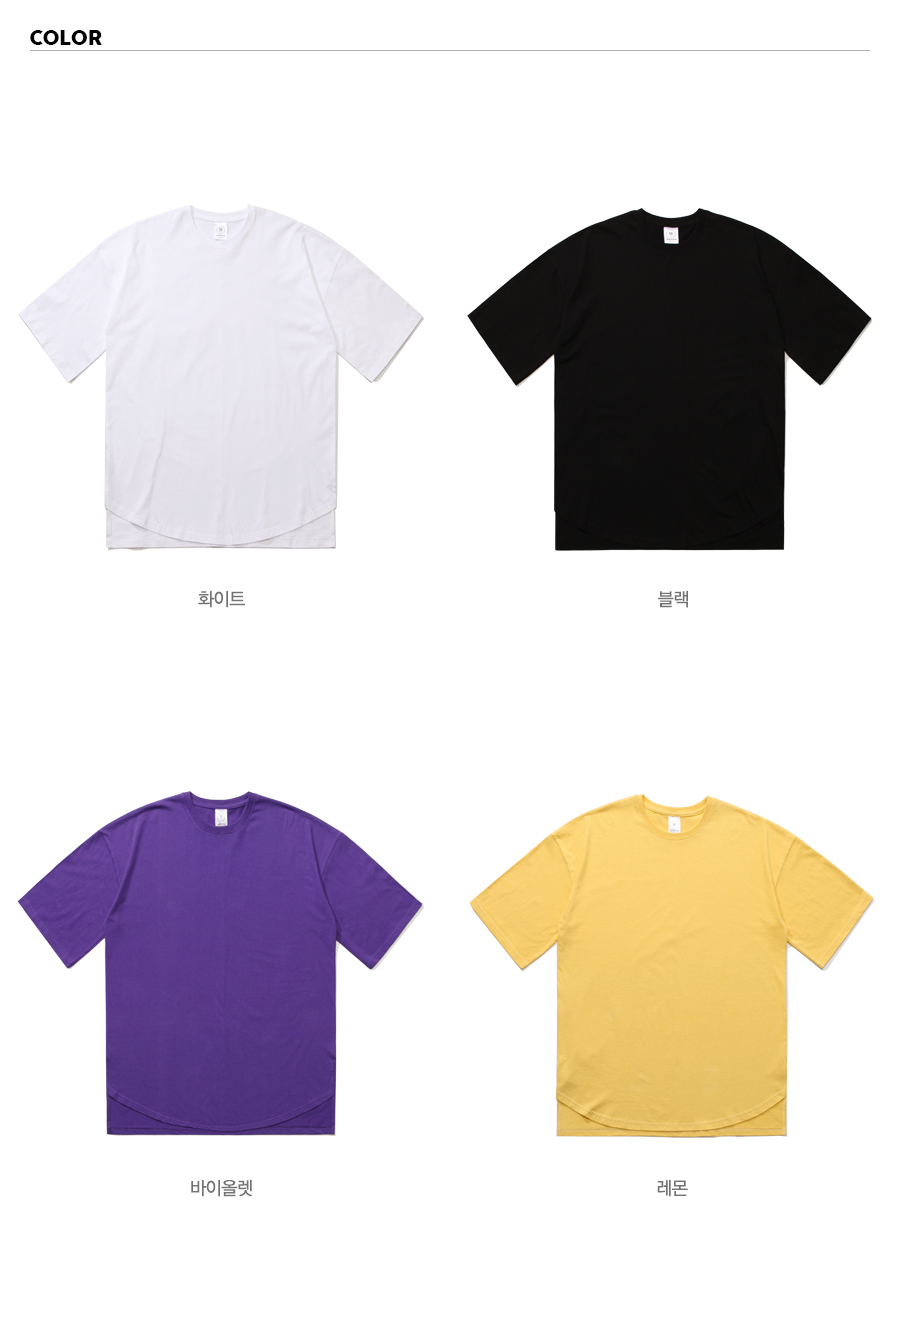 20180313_overfit_short_sleeve_color_kj.jpg